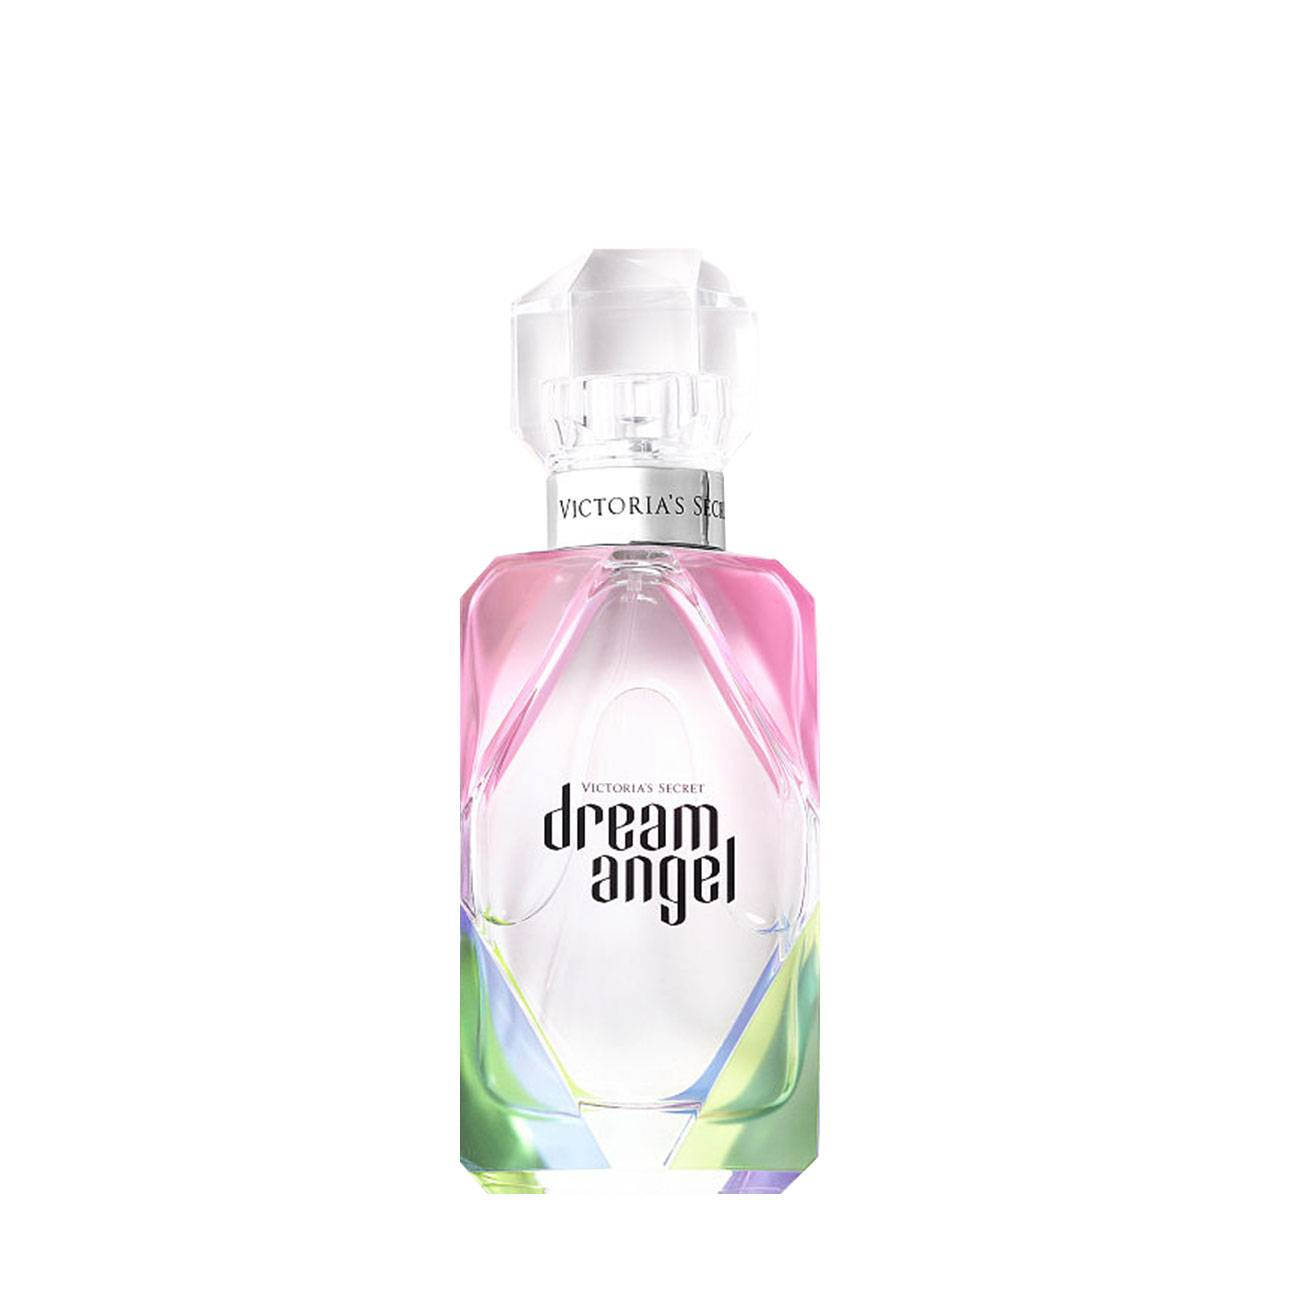 Dream Angel 100ml Victoria's Secret imagine 2021 bestvalue.eu